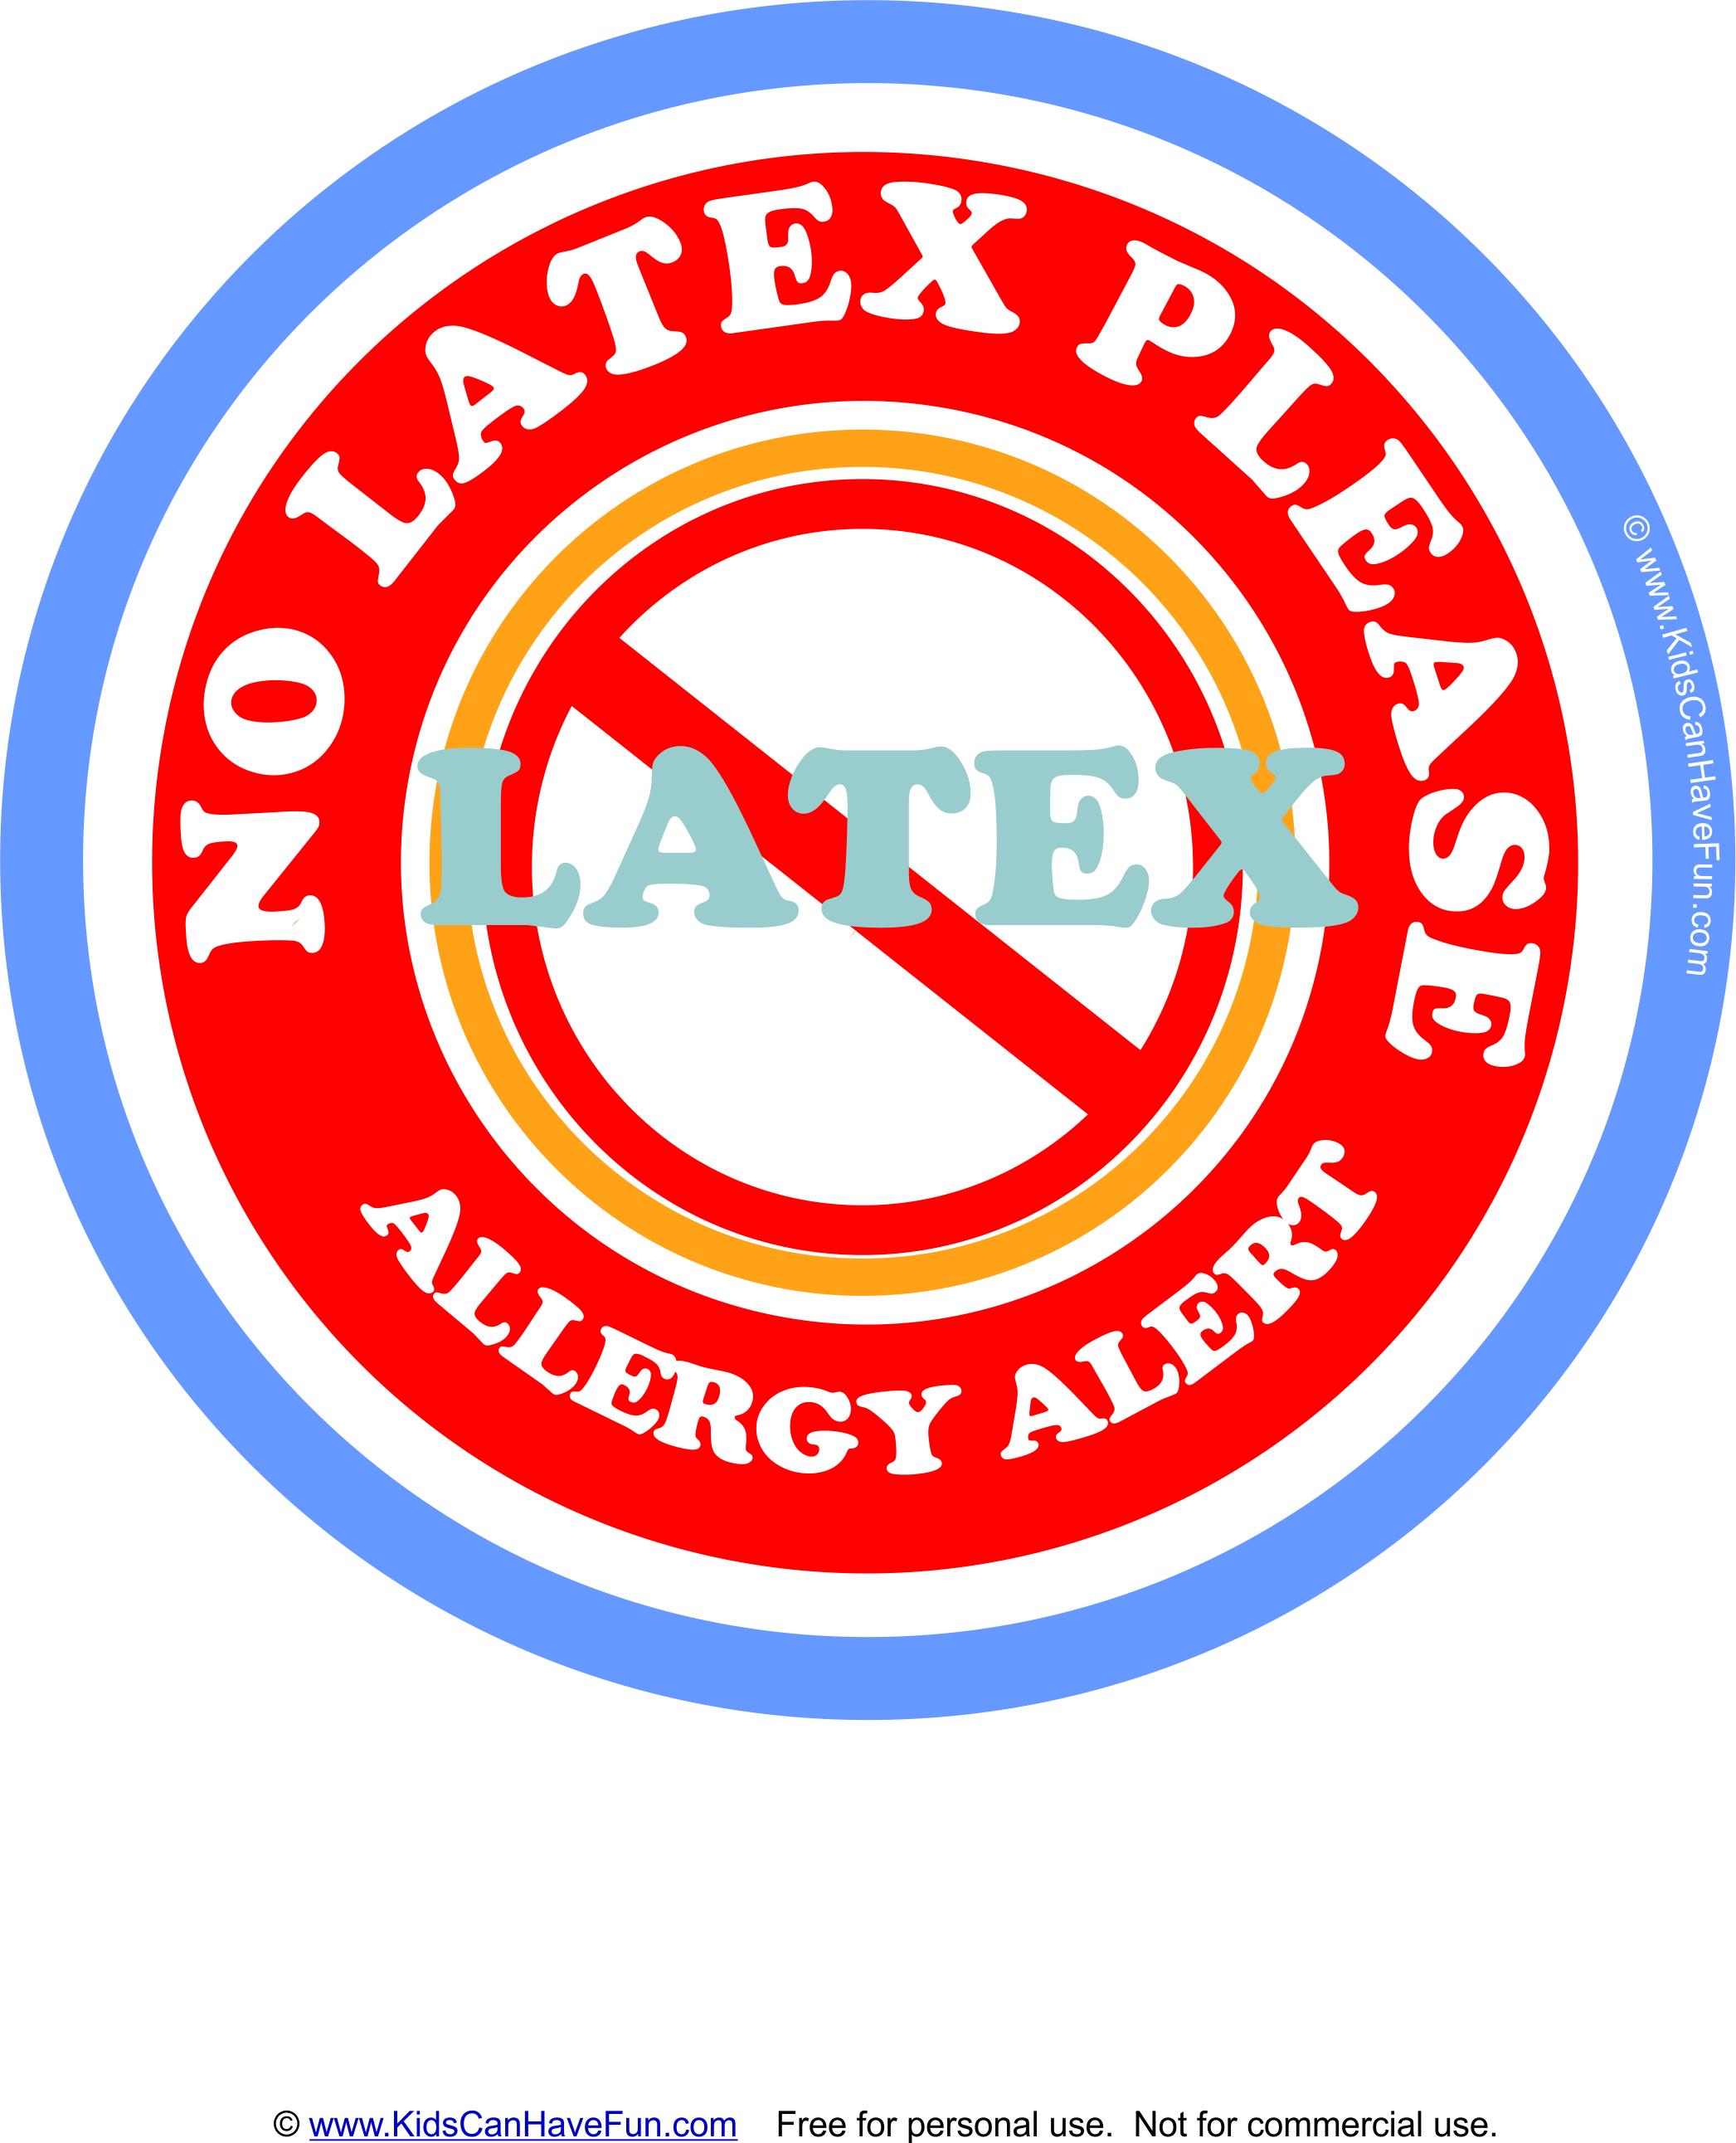 Pinpinning Teacher On Classroom First Aid | Latex Allergy, Nut - Printable Peanut Free Classroom Signs